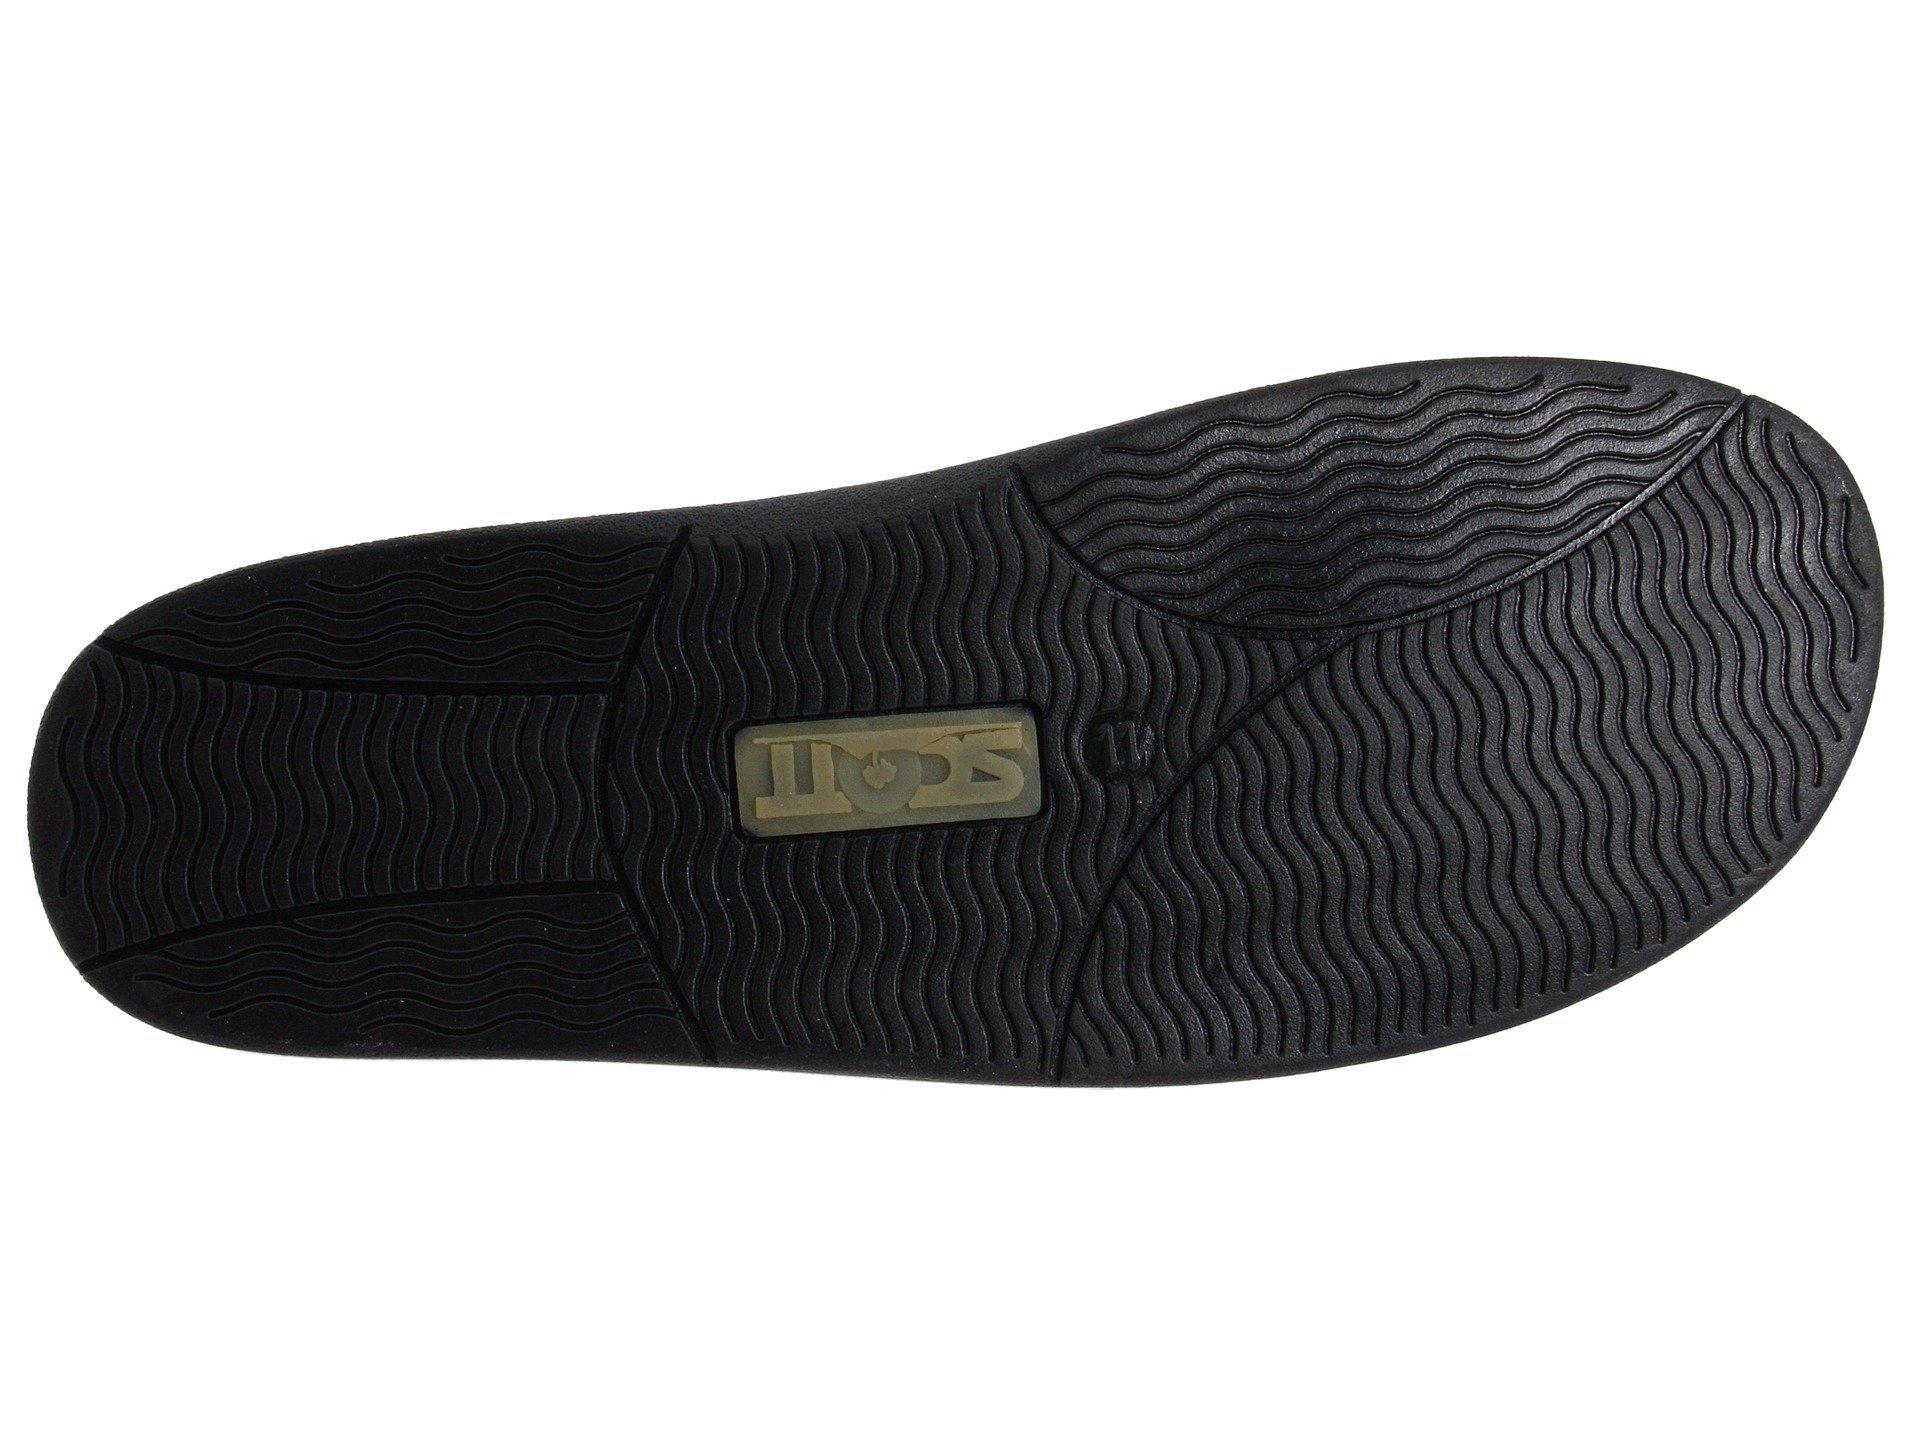 d23e1743d1923 Scott Hawaii - Blue Makaha (black) Men s Sandals for Men - Lyst. View  fullscreen